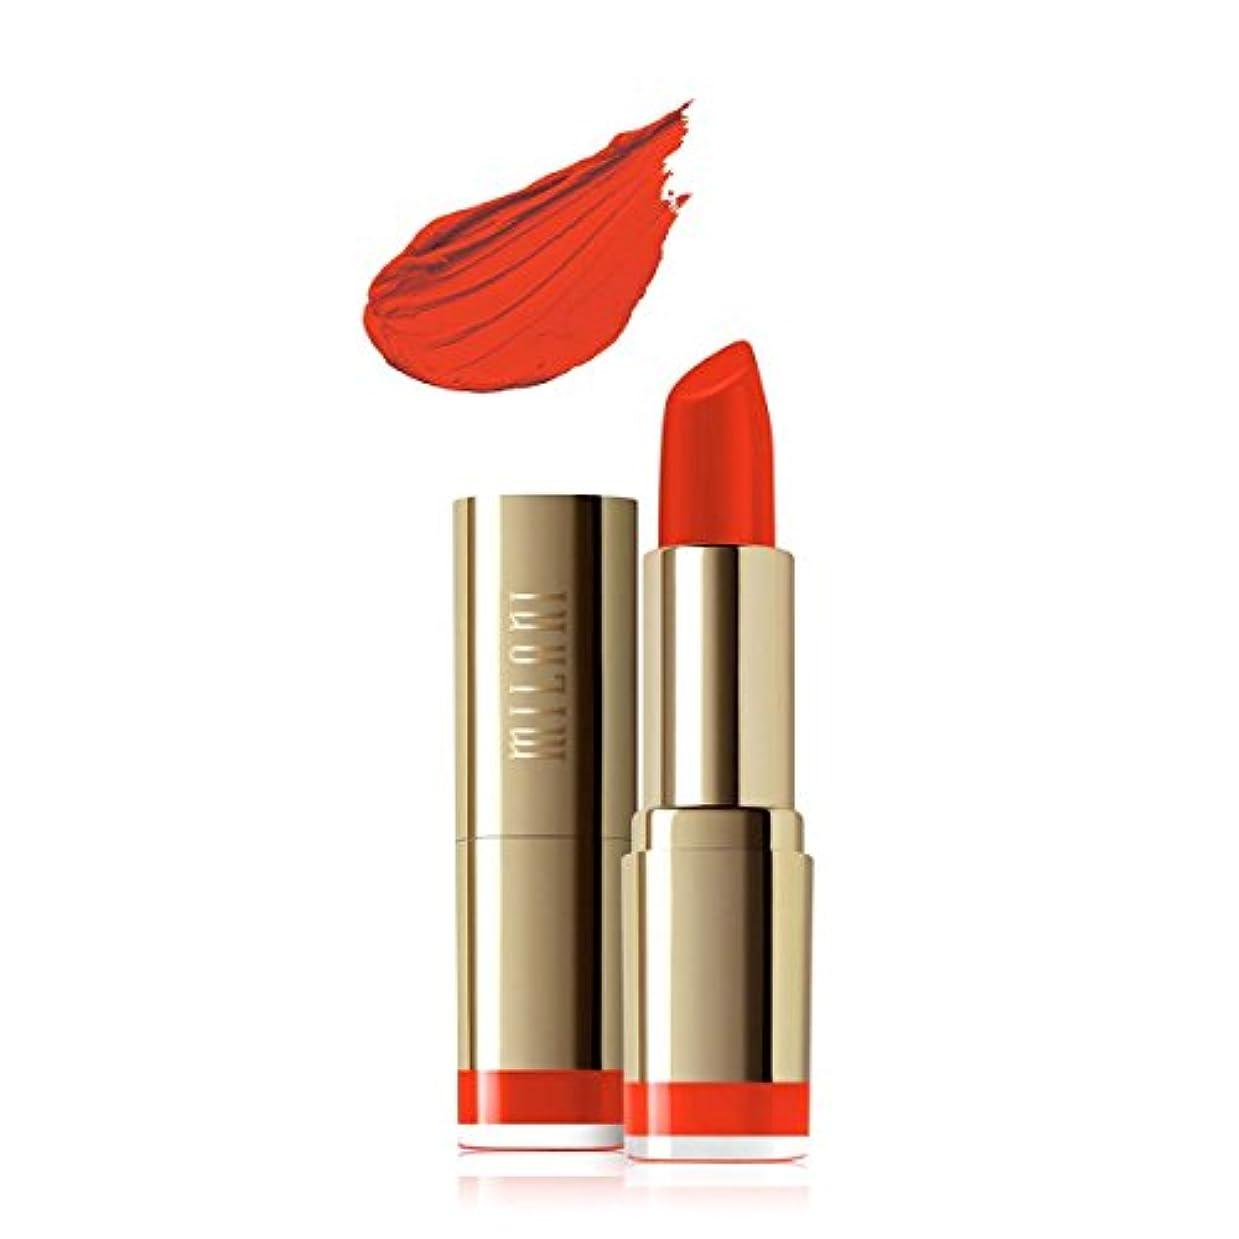 MILANI Color Statement Moisture Matte Lipstick - Matte Passion (Vegan) (並行輸入品)